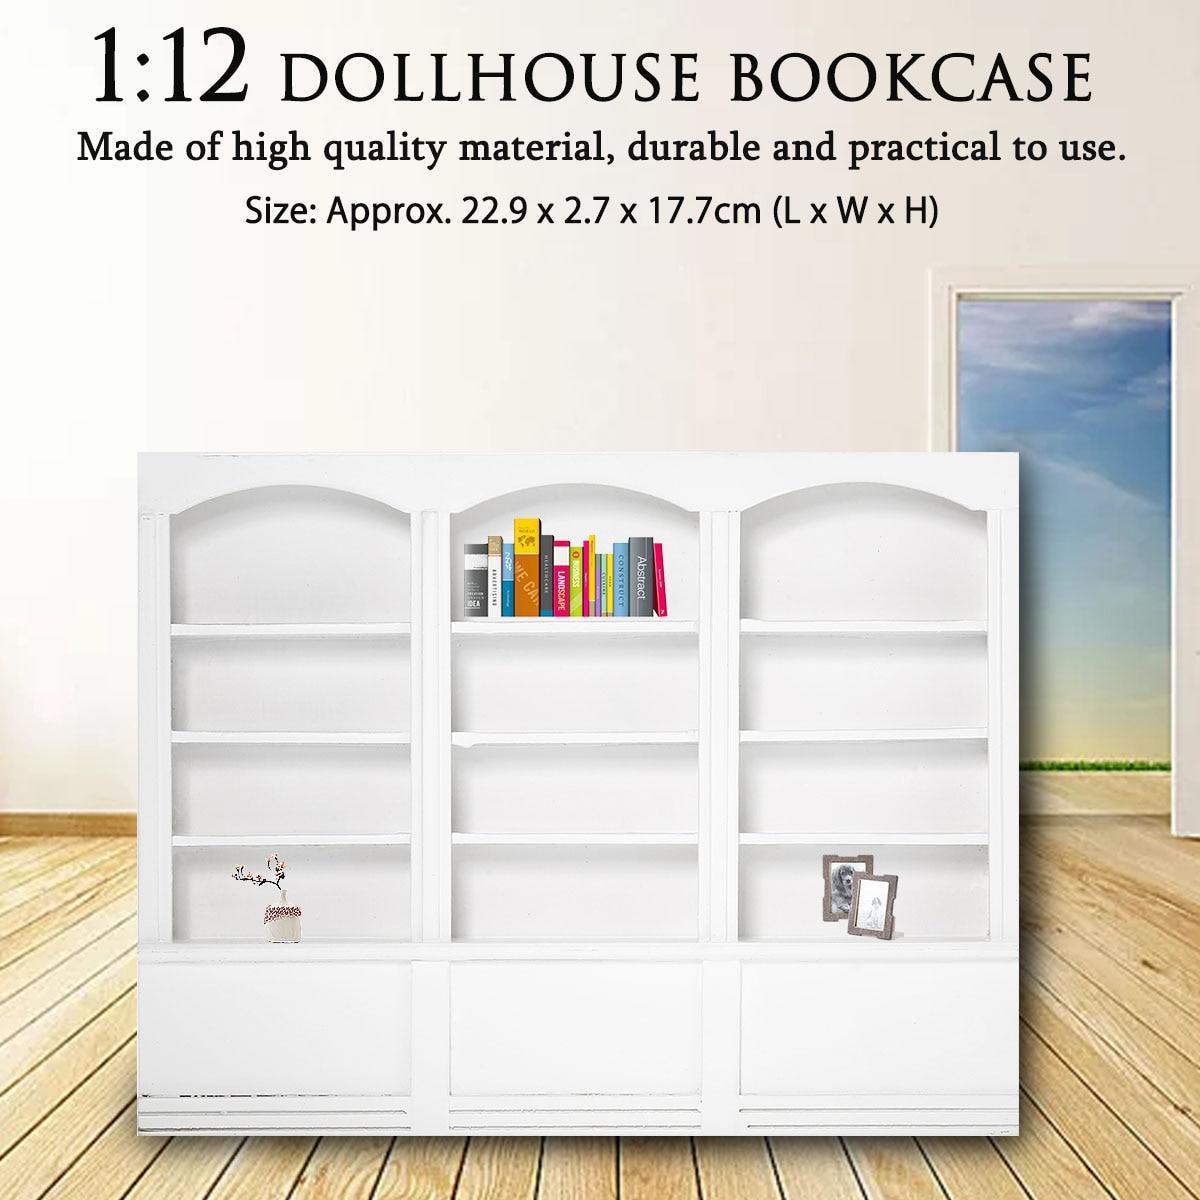 1:12 Multifunction Wood Cabinet Bookcase Dollhouse Miniature Furniture Kitchen Dining Display Shelf White 22.9x2.7x17.7 Cm